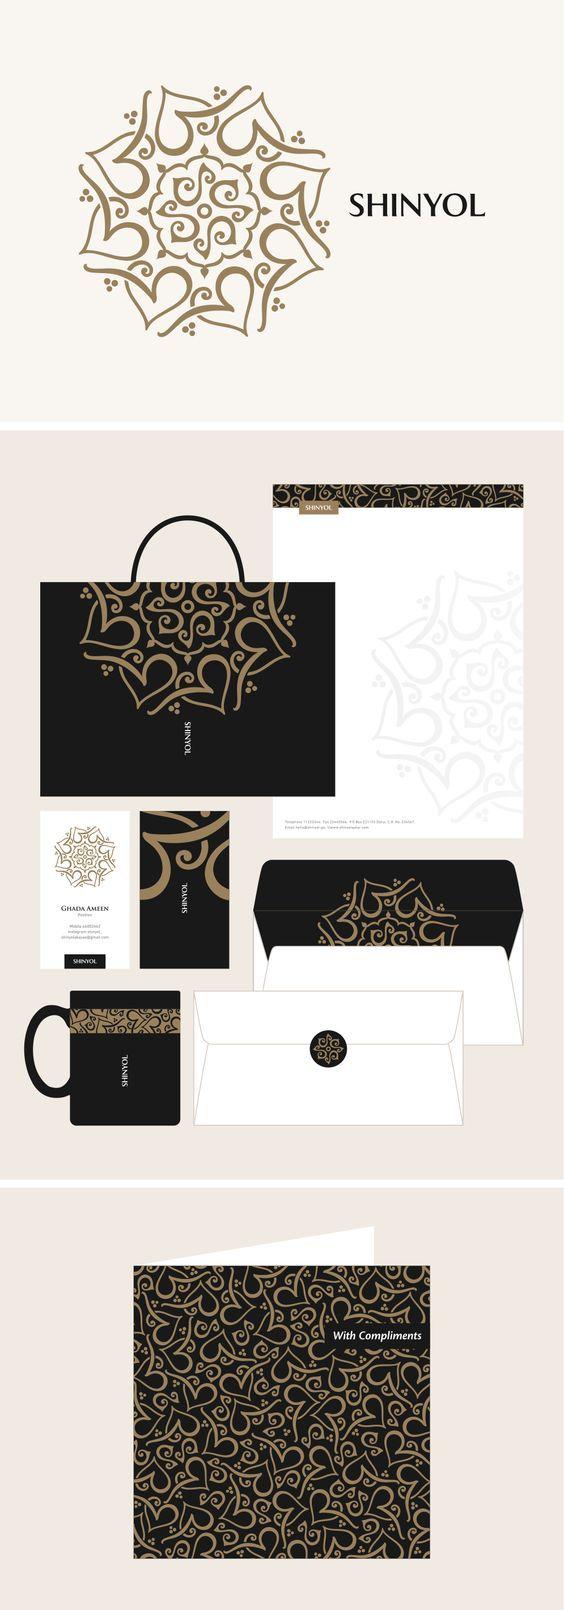 Arabesque style Arabic logo/identity design for an Abaya boutique